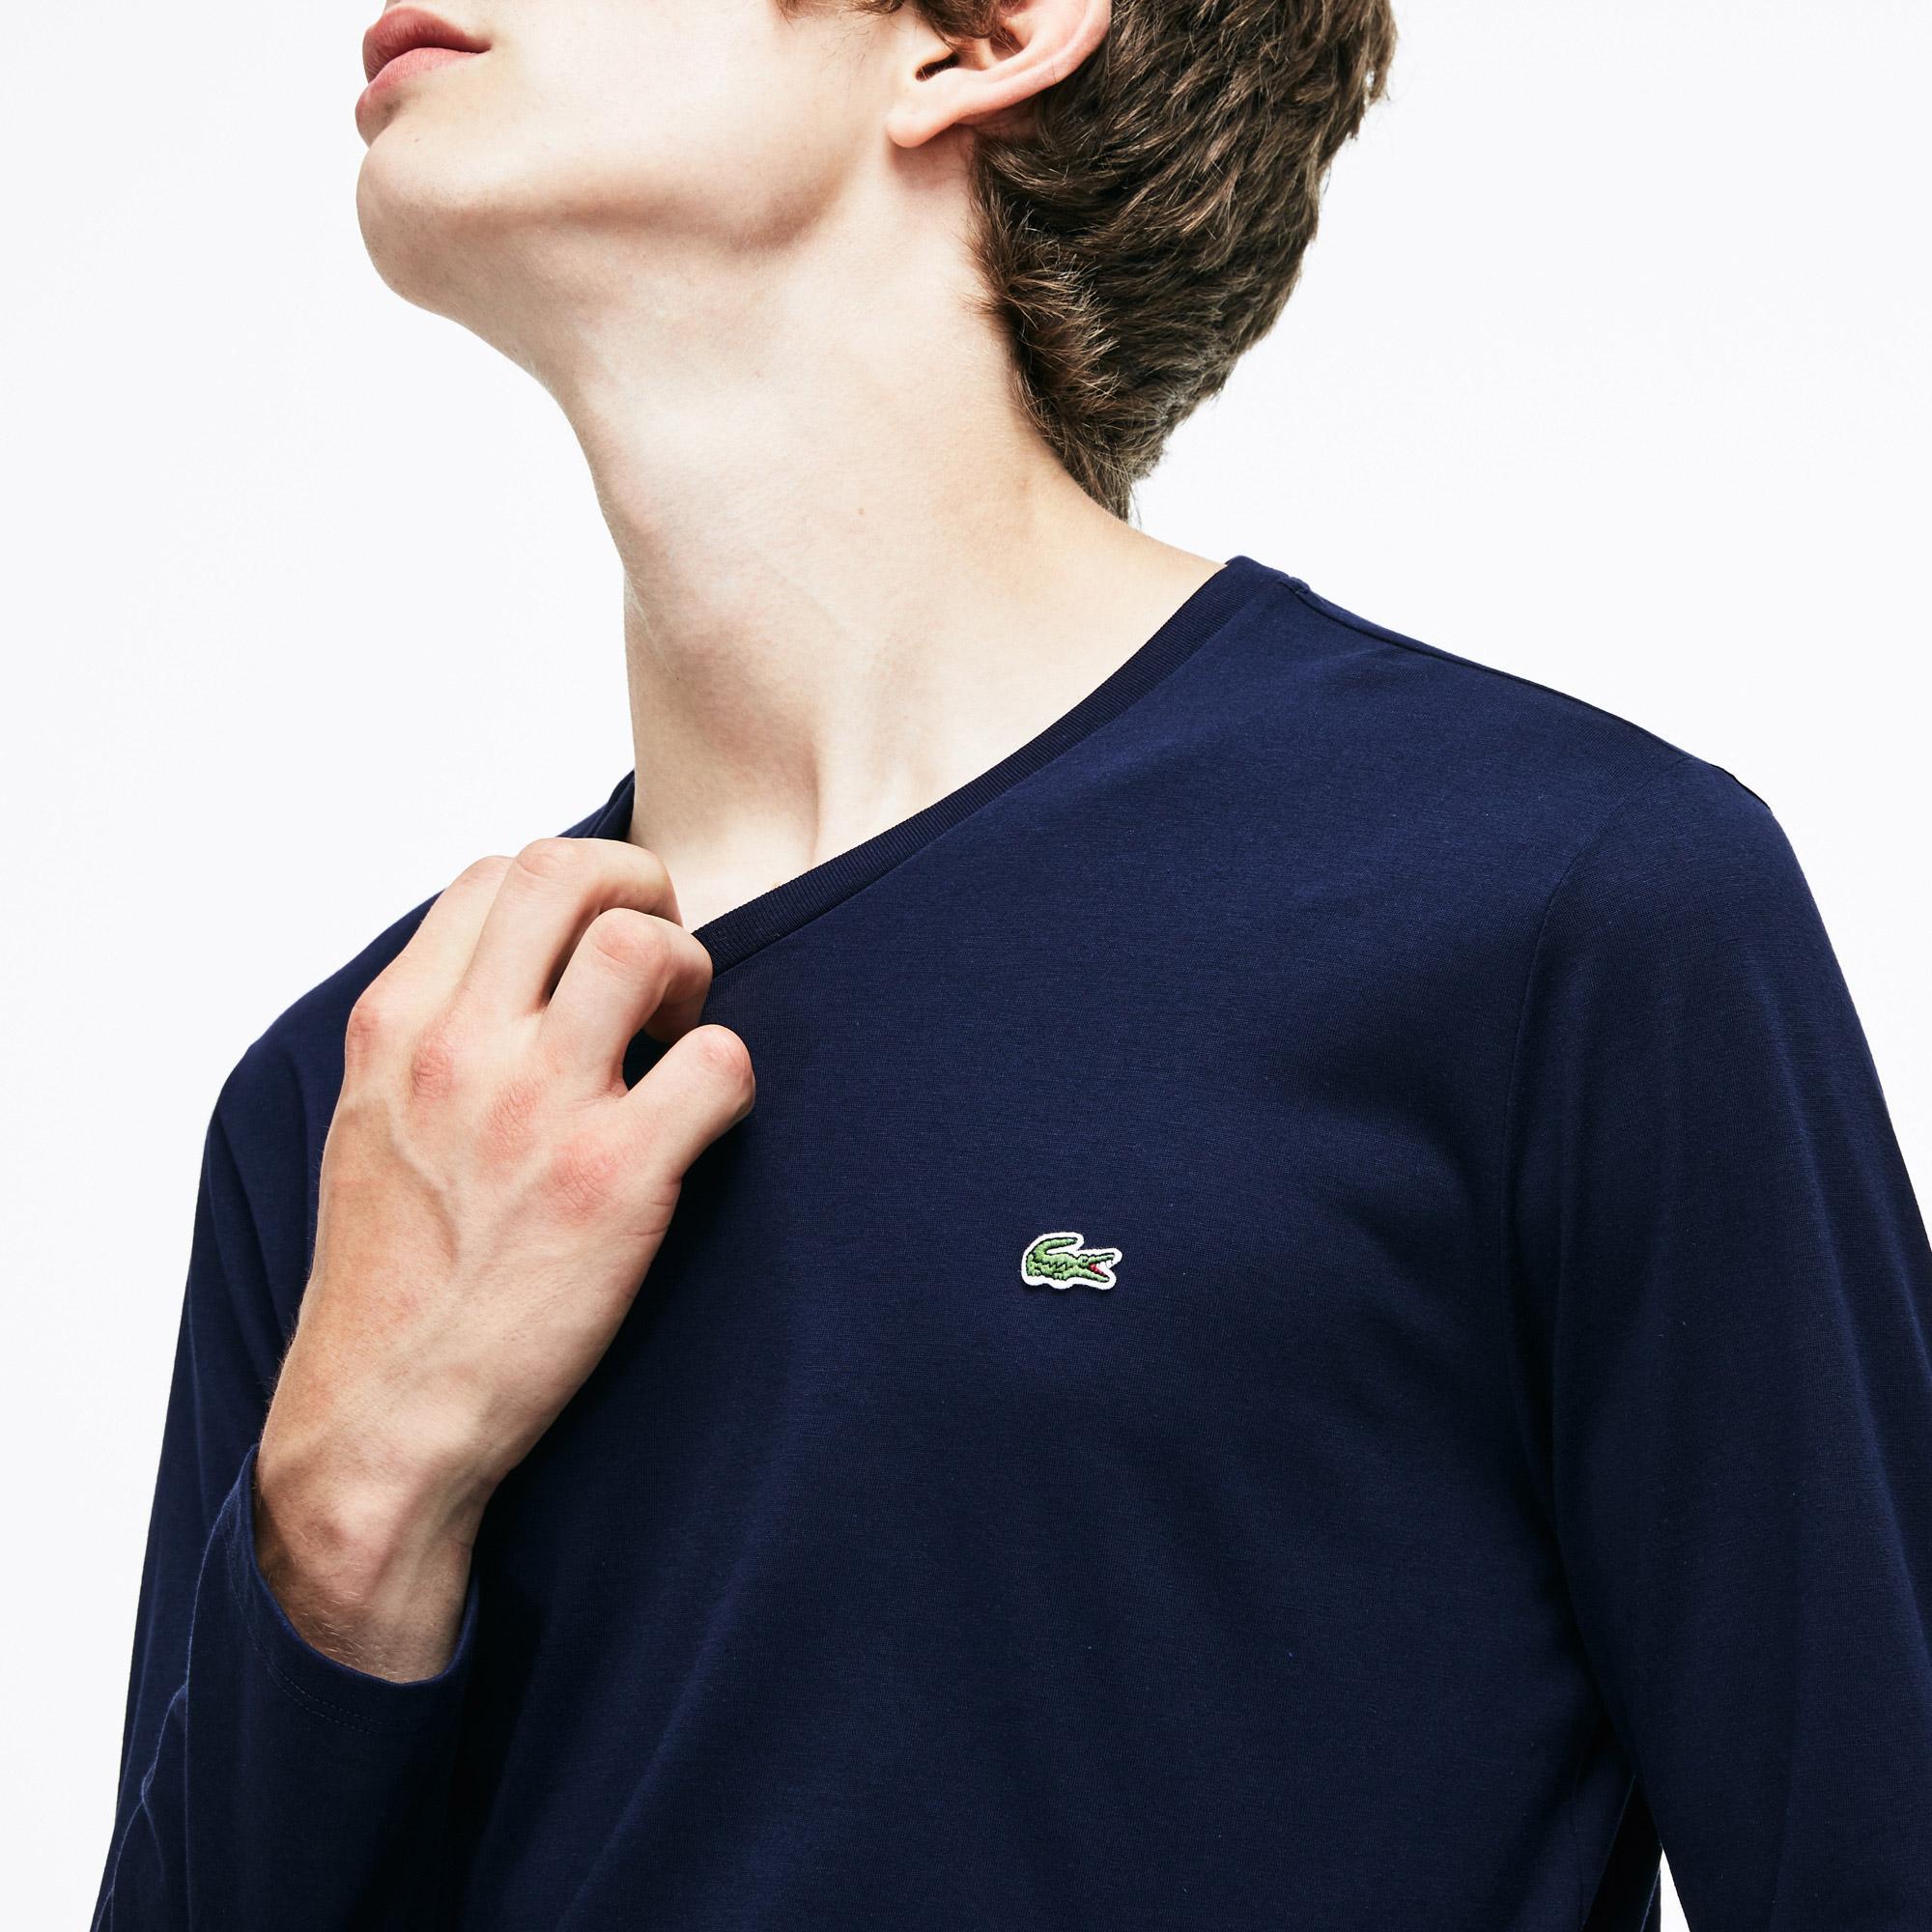 Lacoste Erkek Regular Fit Lacivert Uzun Kollu T-Shirt